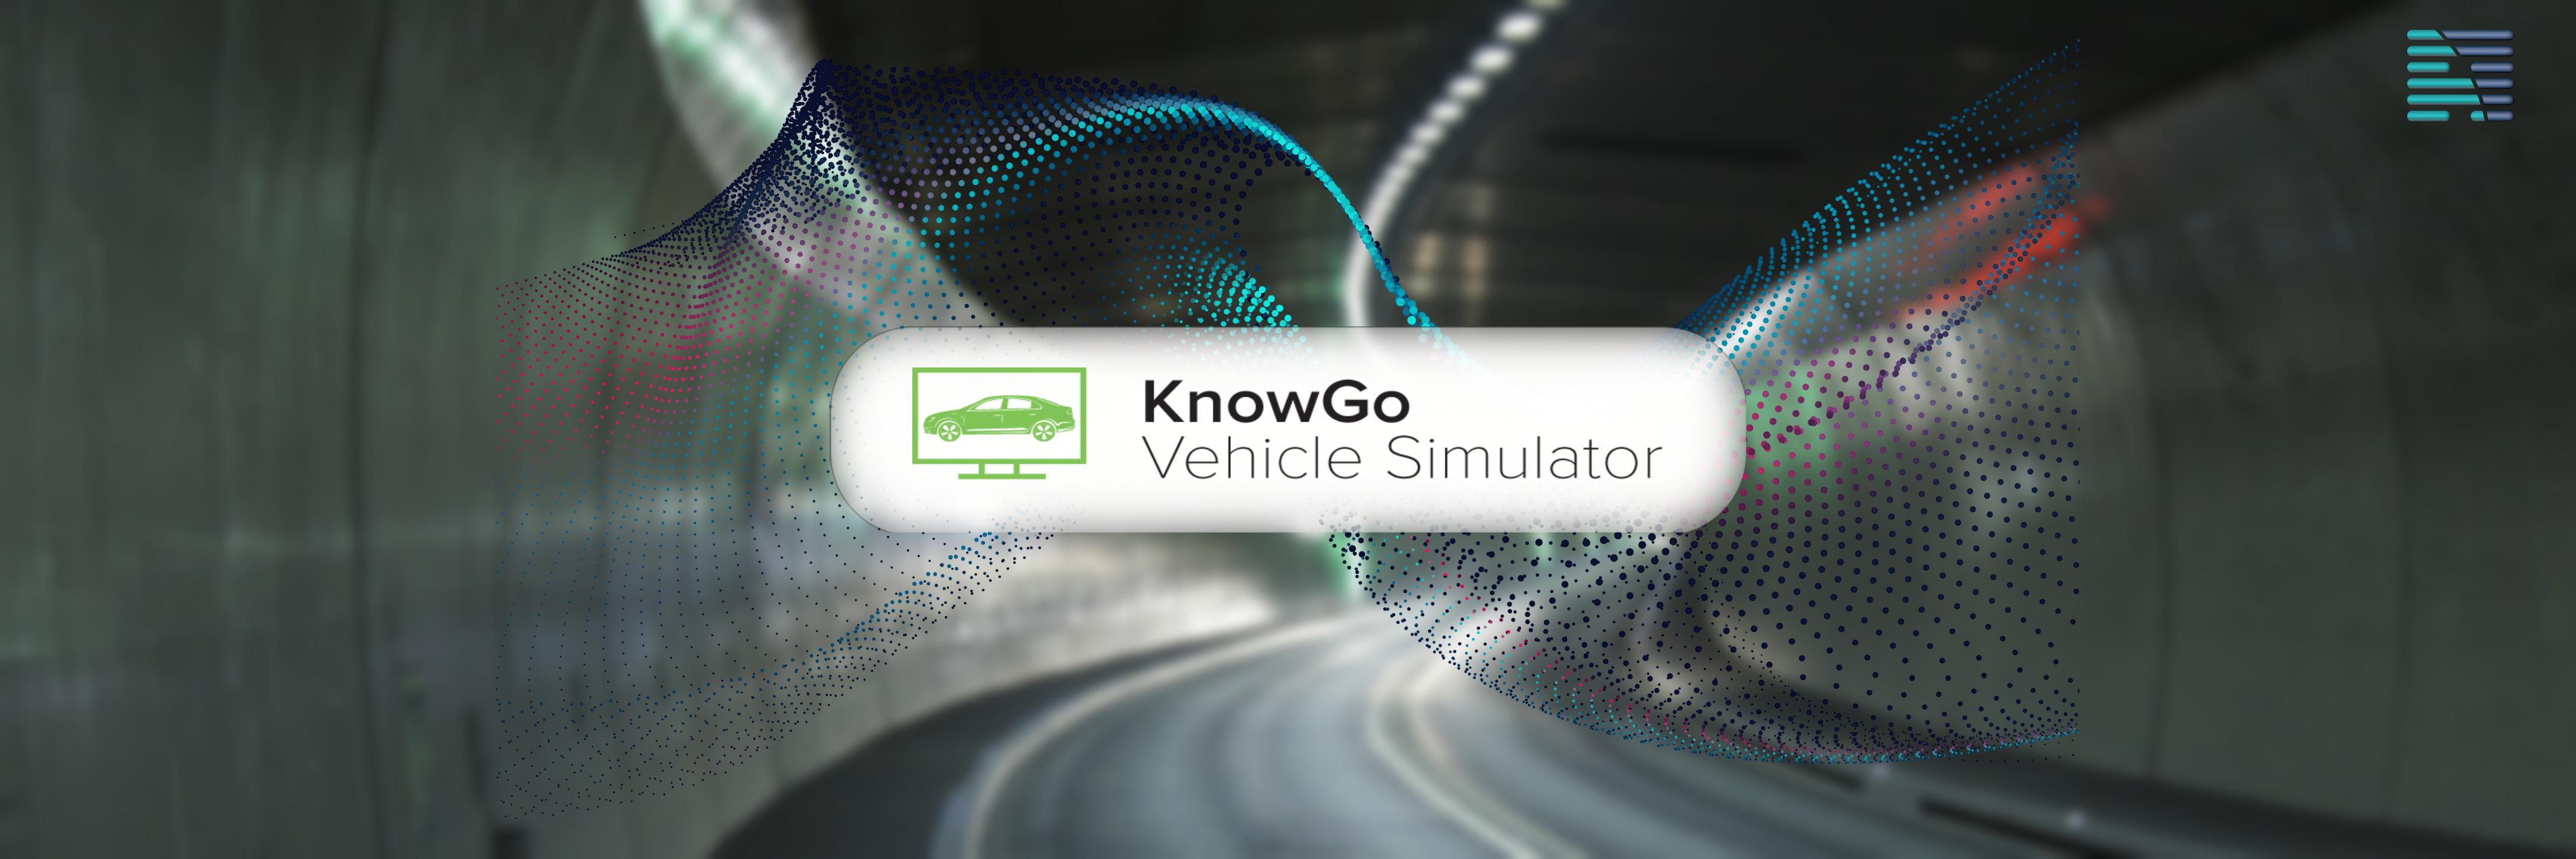 KnowGo Vehicle Simulator banner